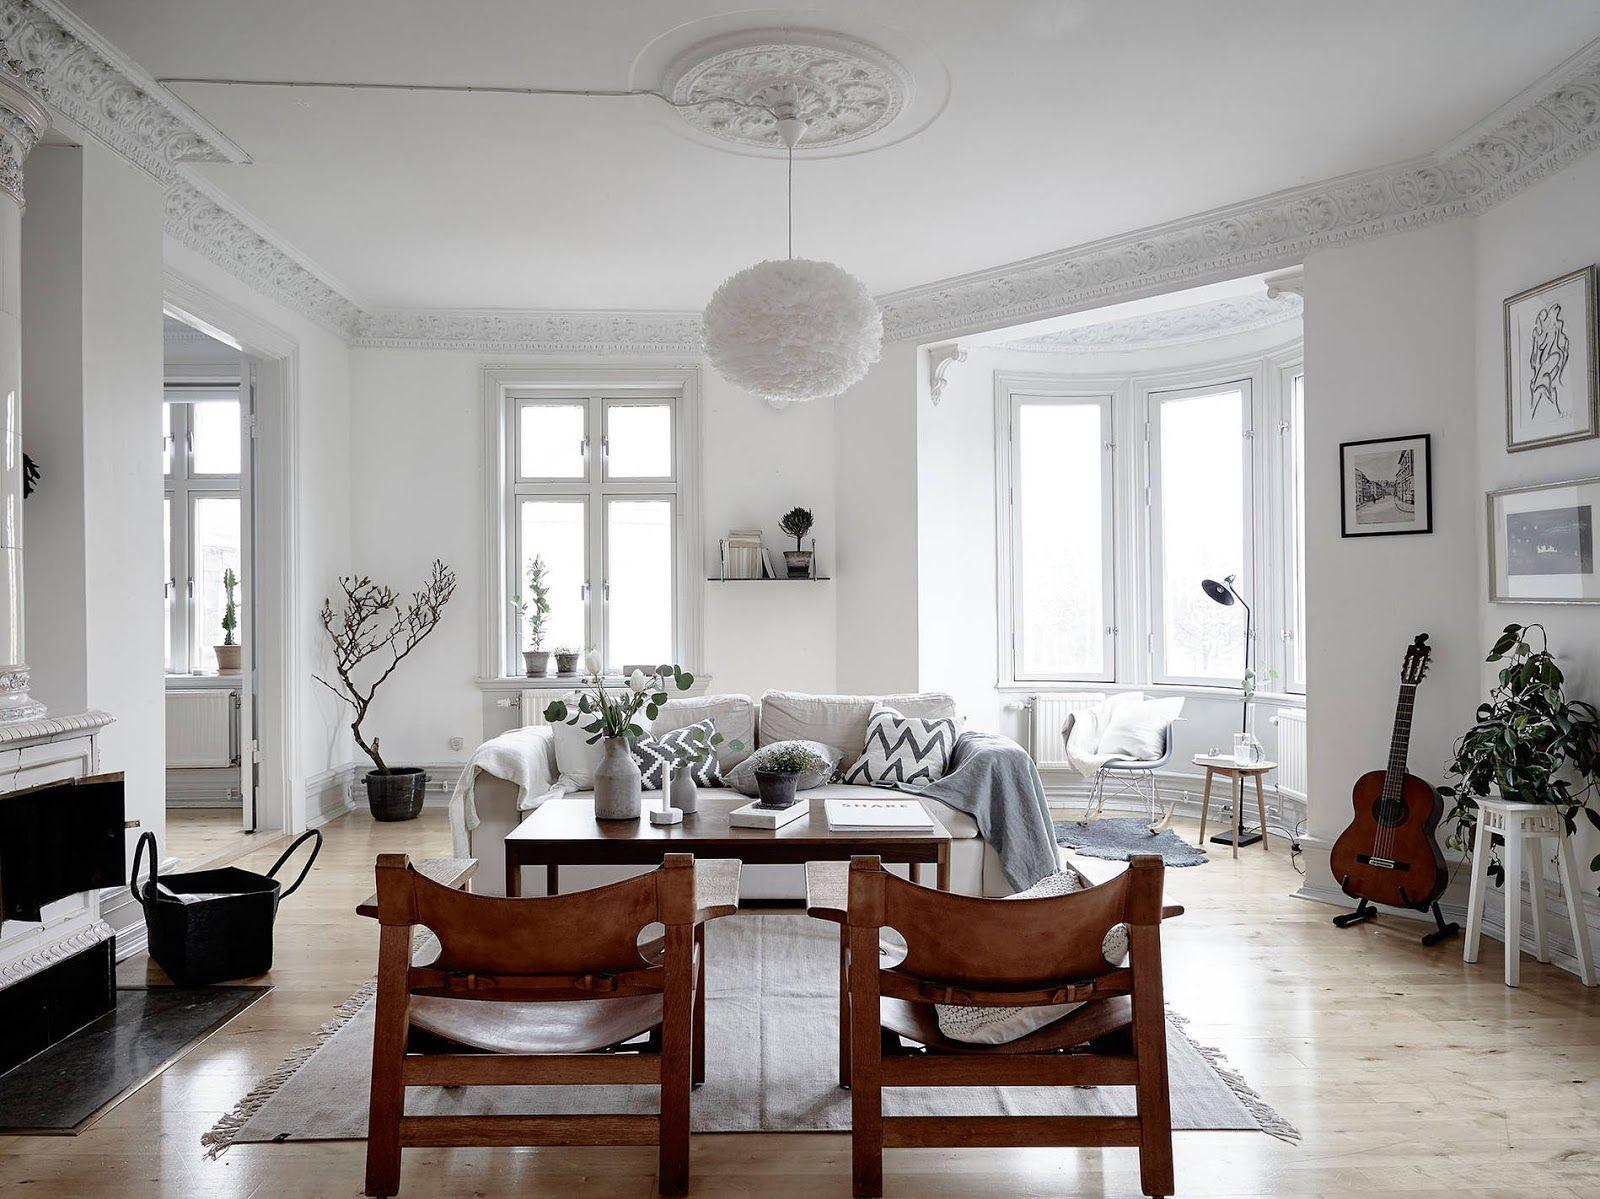 Romantic Apartment with Mid Century Modern Furniture (design ...